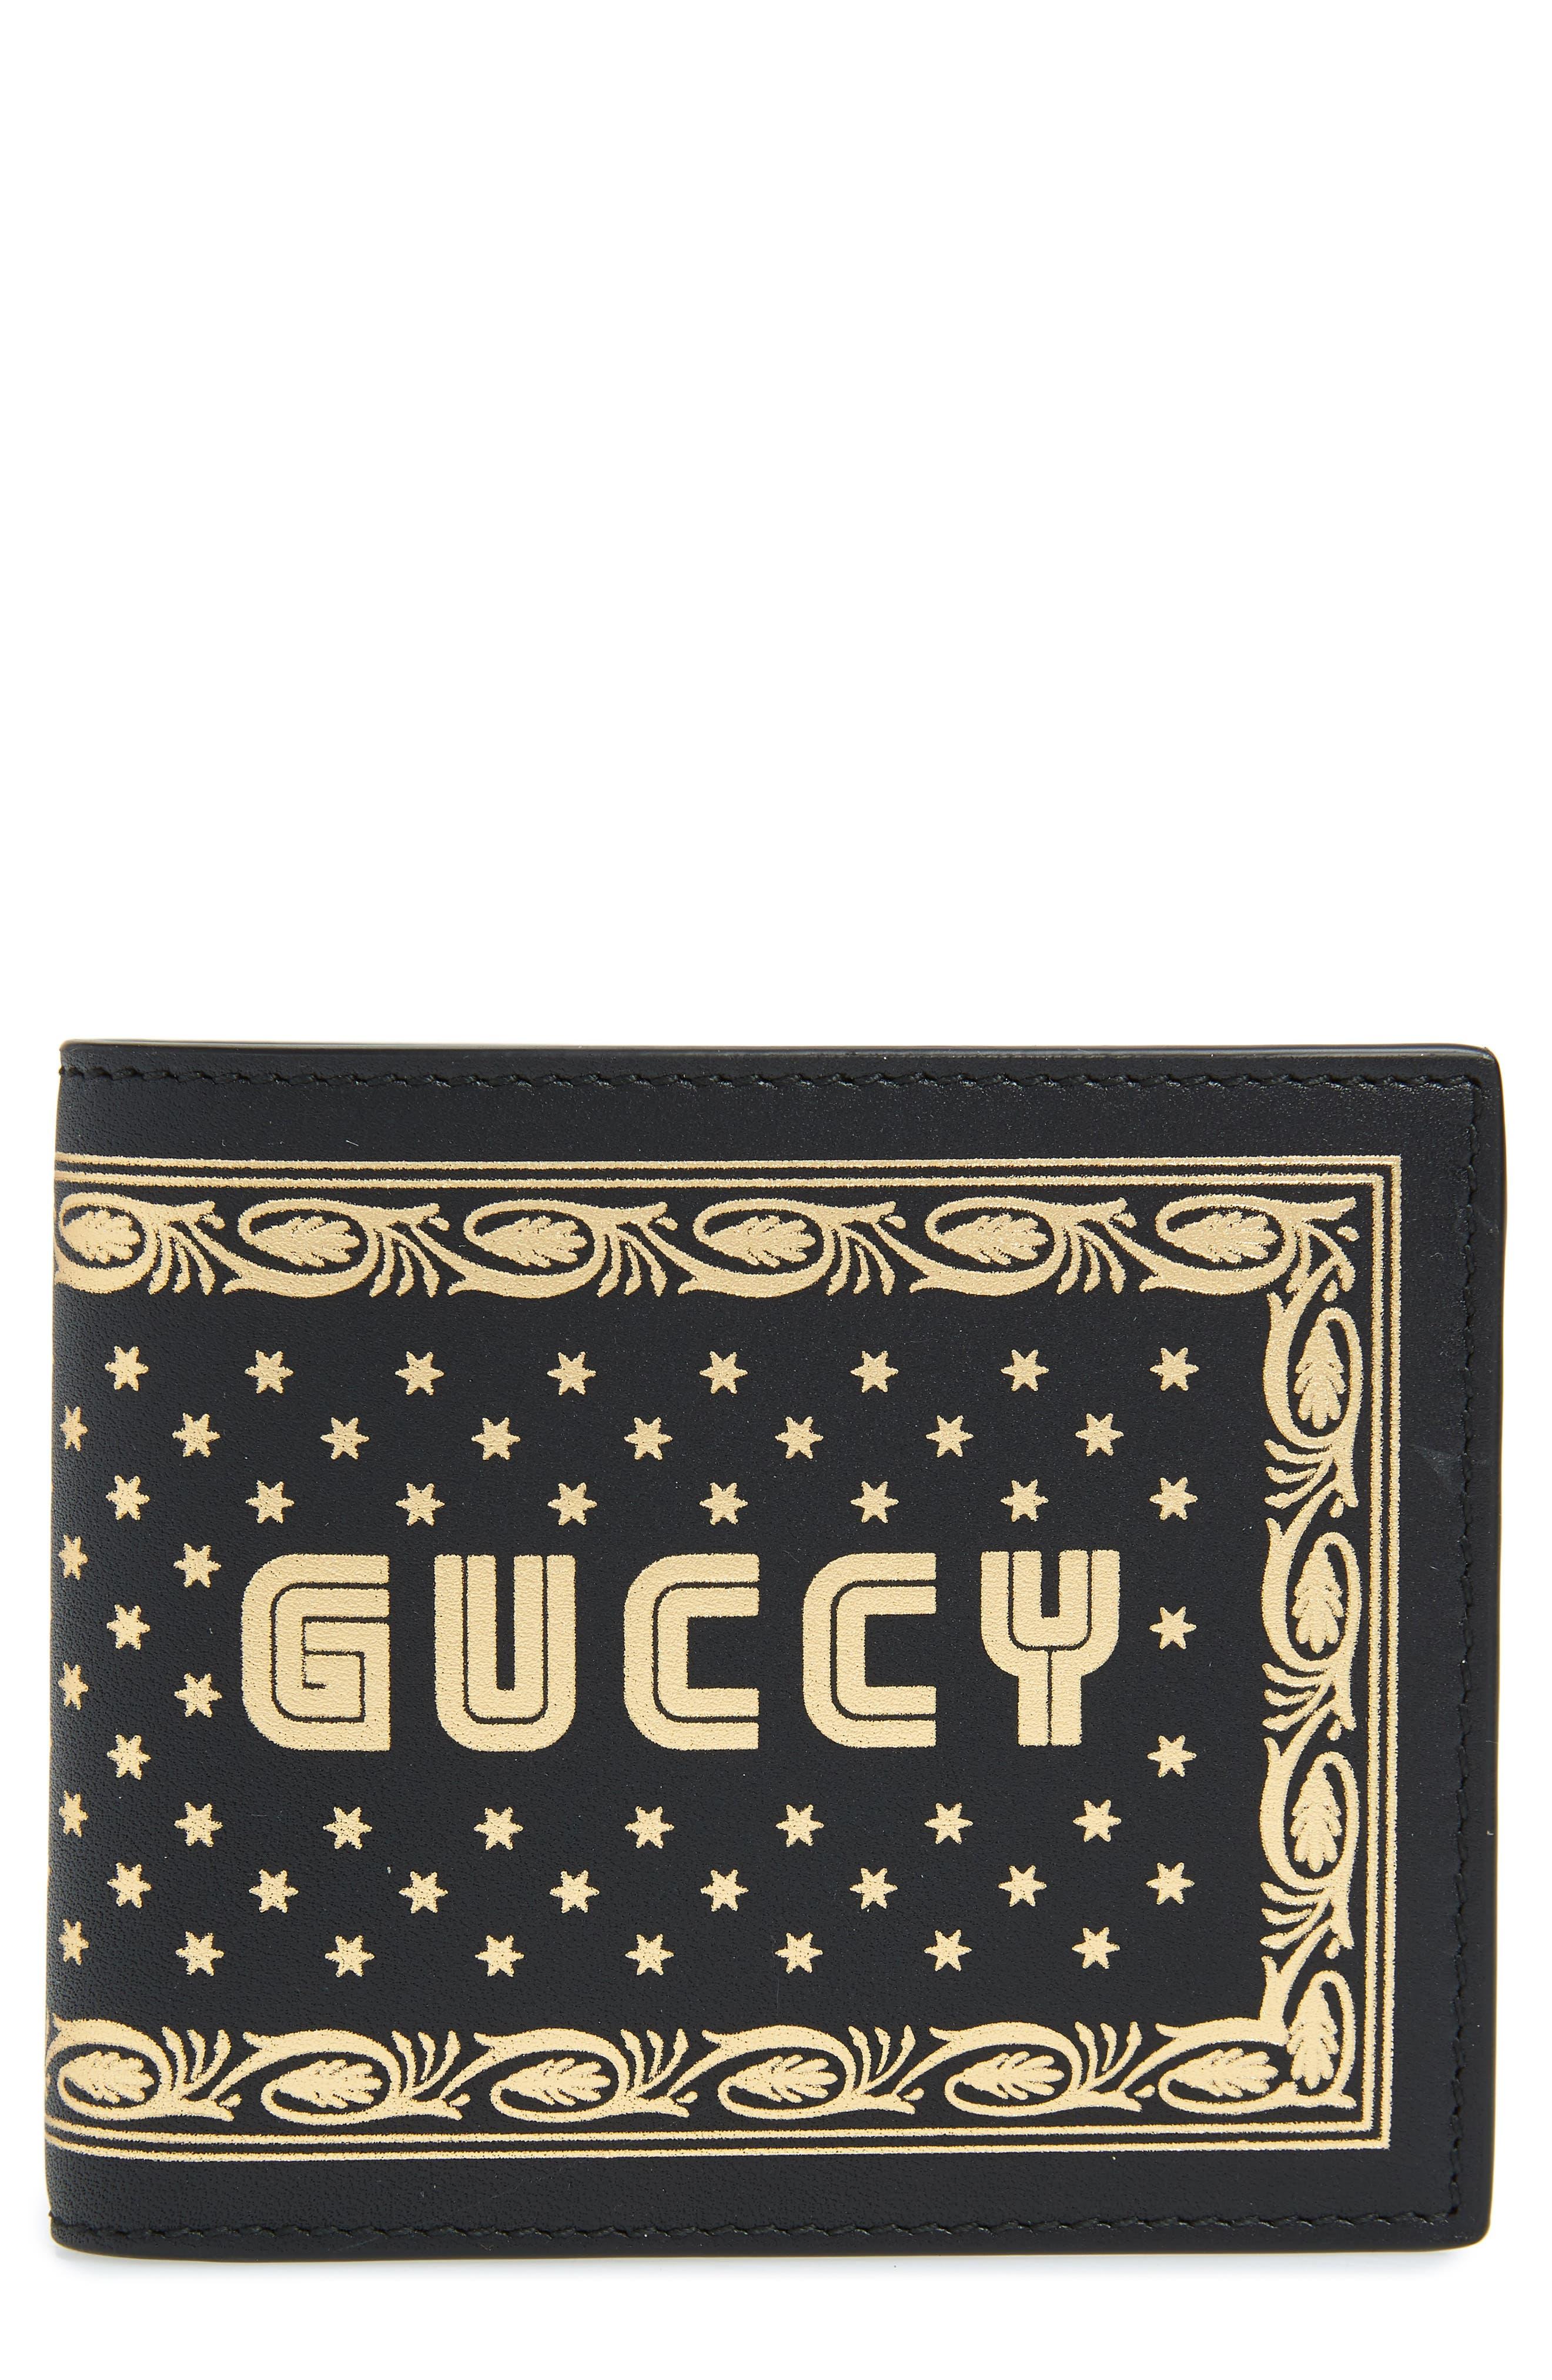 Print Leather Wallet,                         Main,                         color, Light Beige